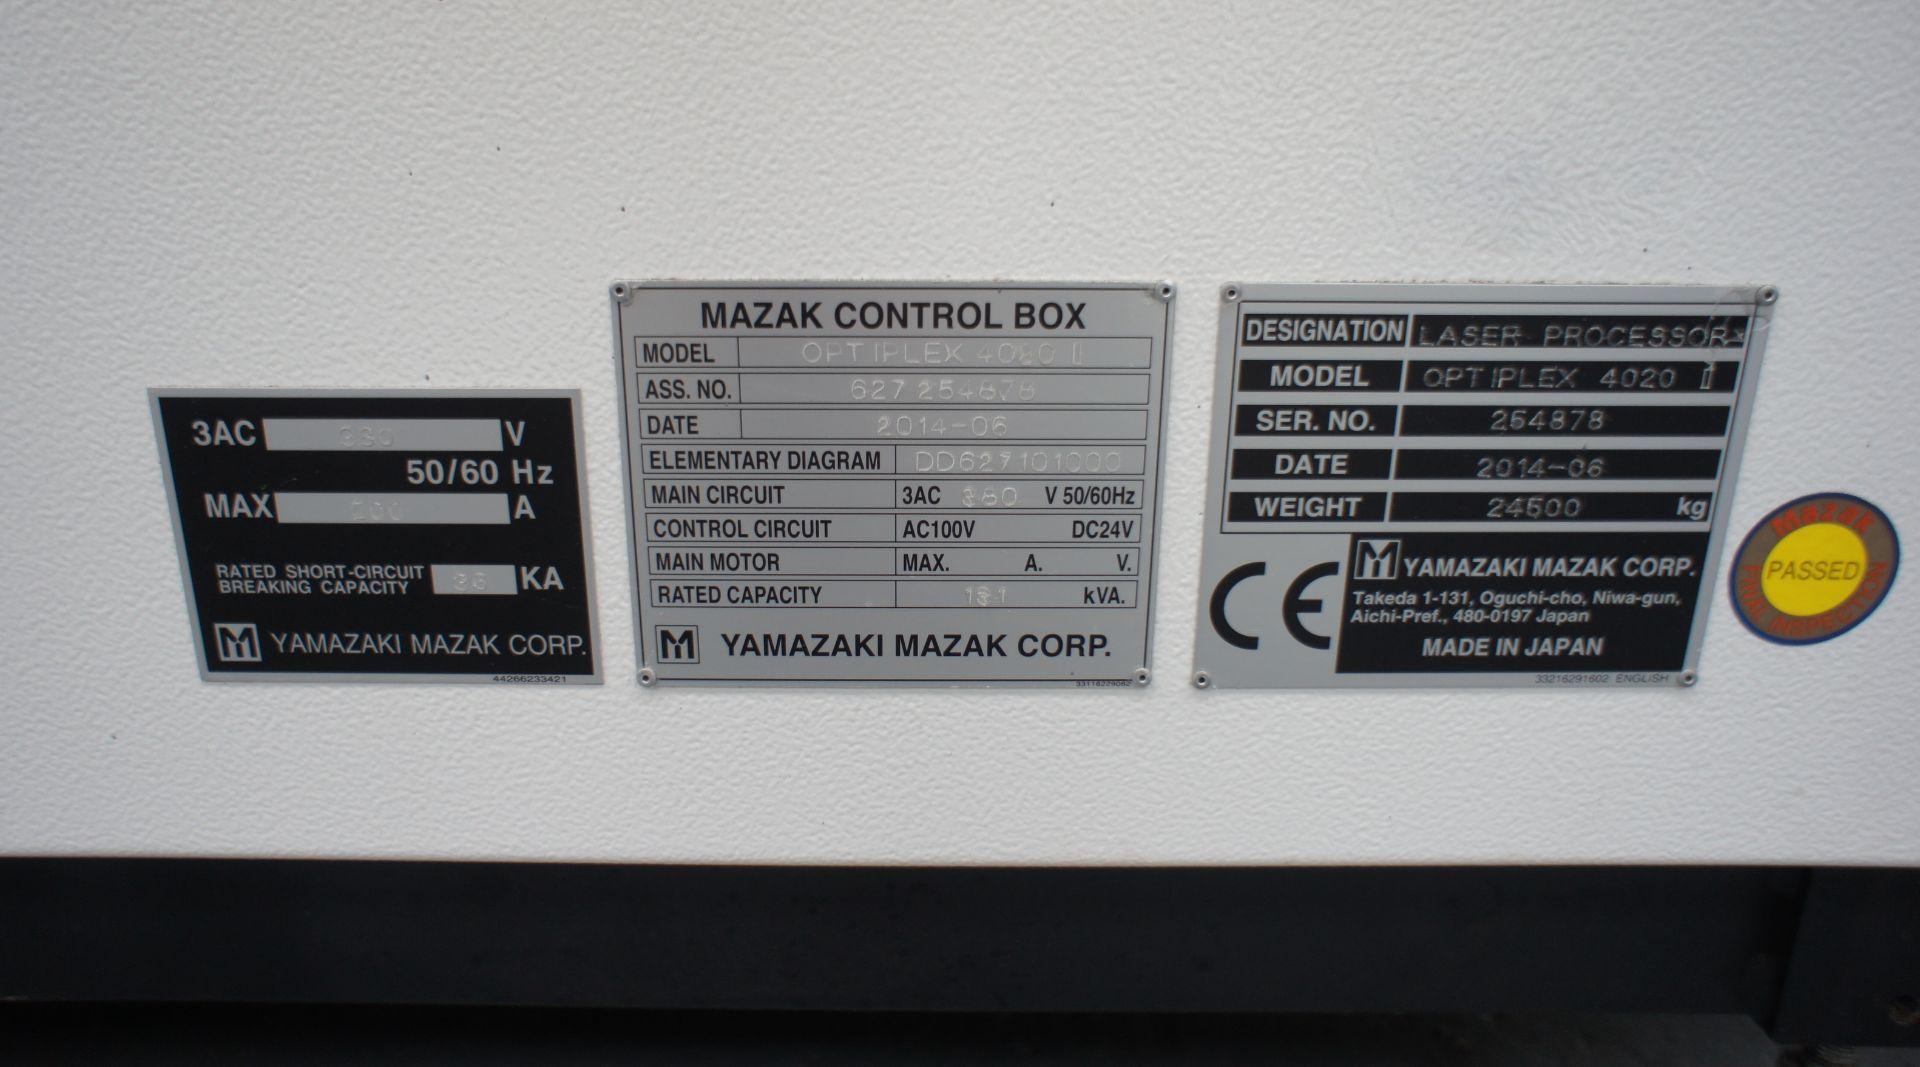 2015 - Mazak OptiPlex 4020 II Laser Cutting Machin - Image 10 of 15